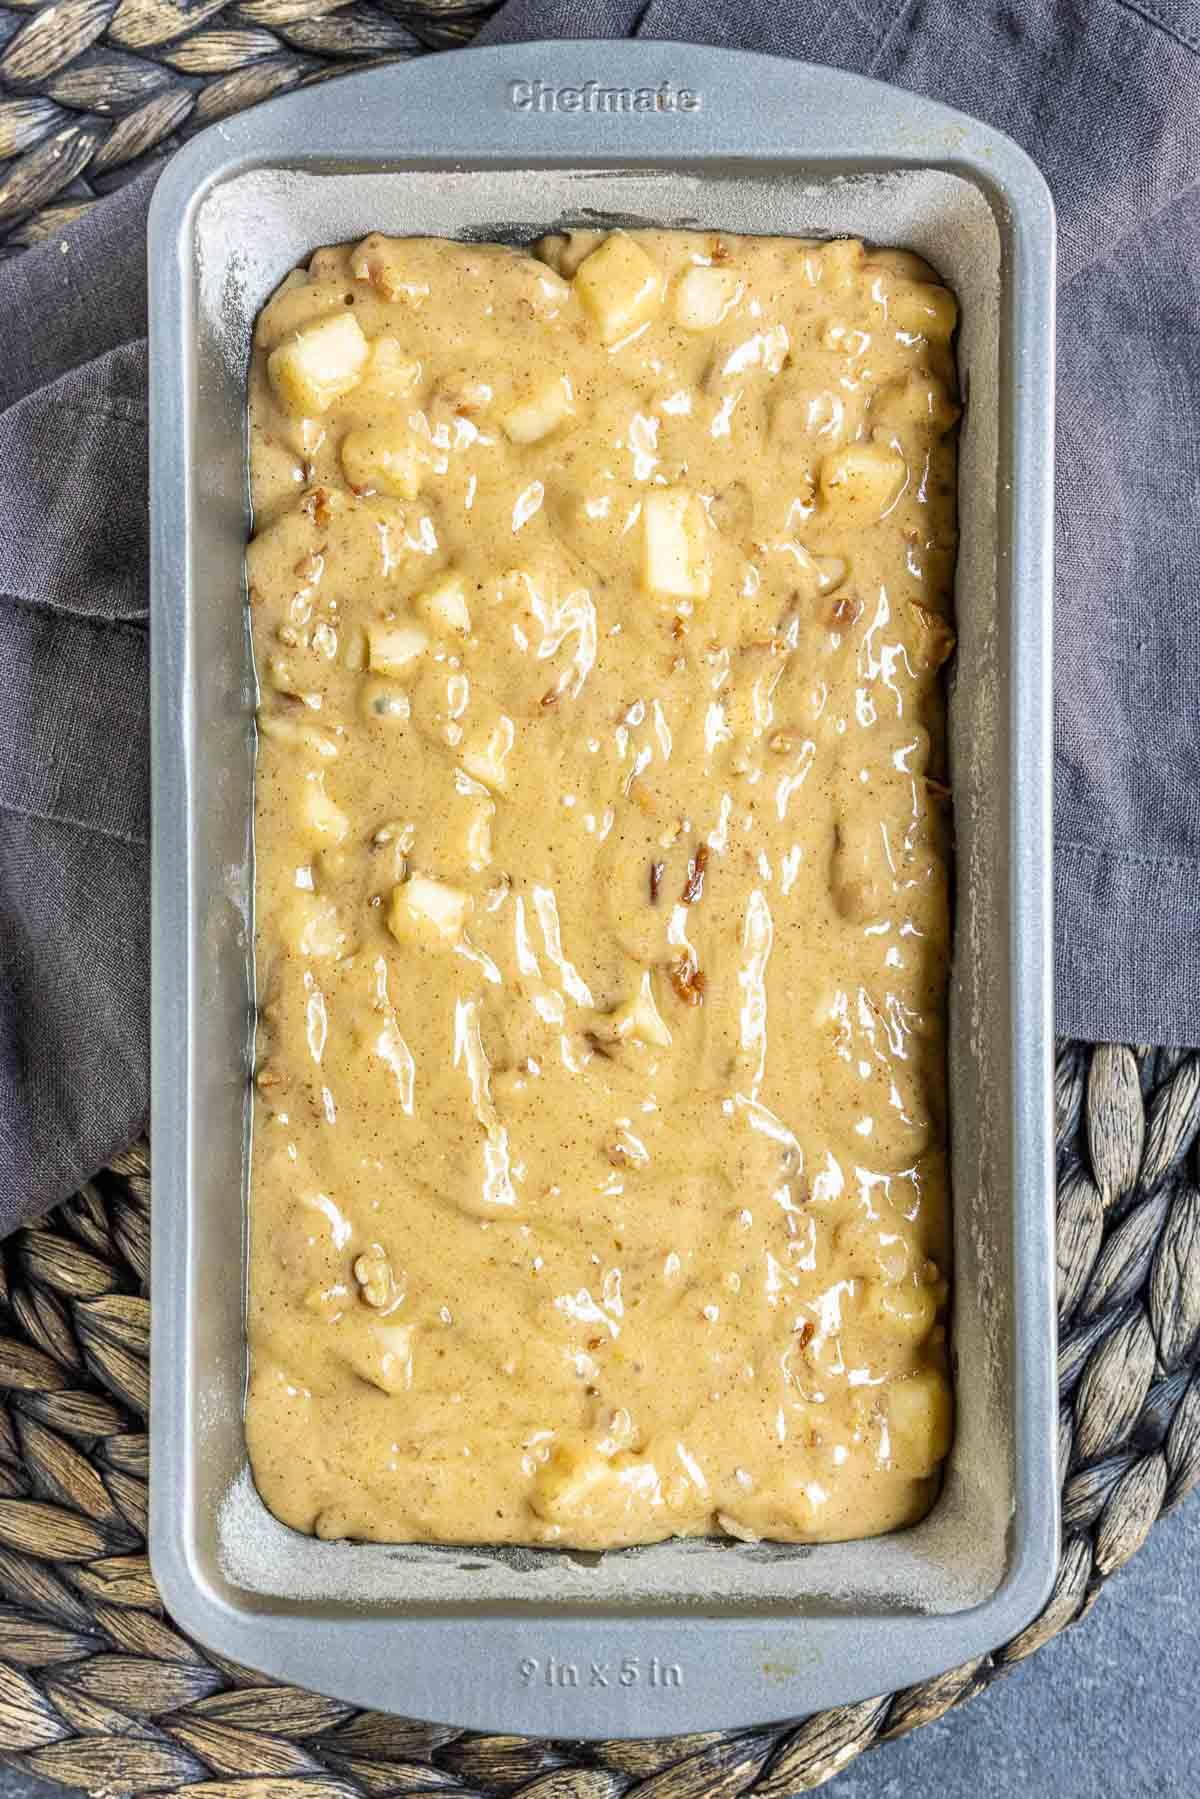 Caramel Apple Bread dough